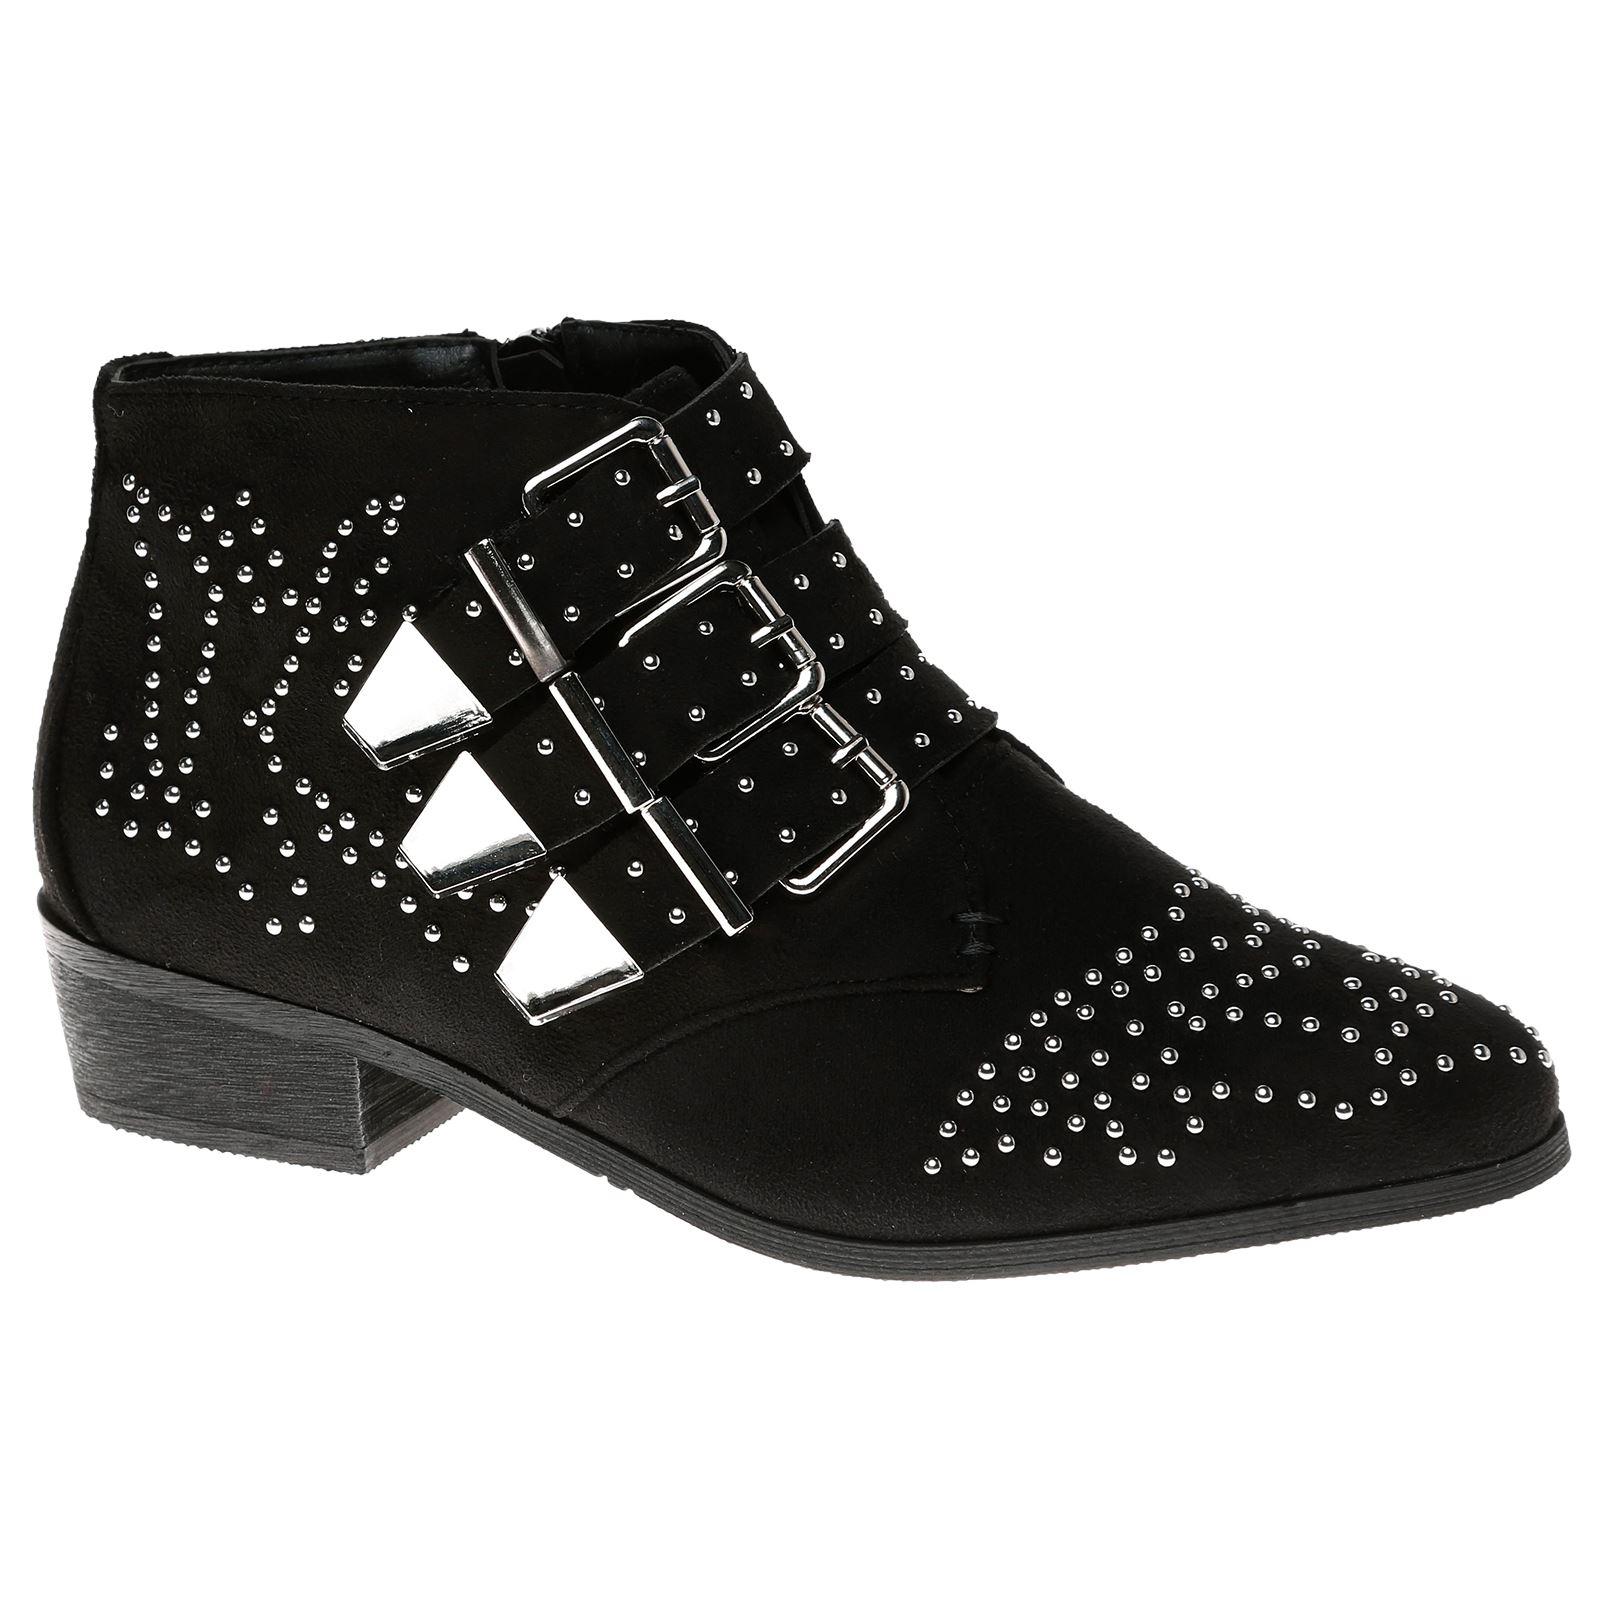 7de102fc256 Womens Flats Low HEELS Buckle Strappy Biker Ankle BOOTS Ladies Shoes ...